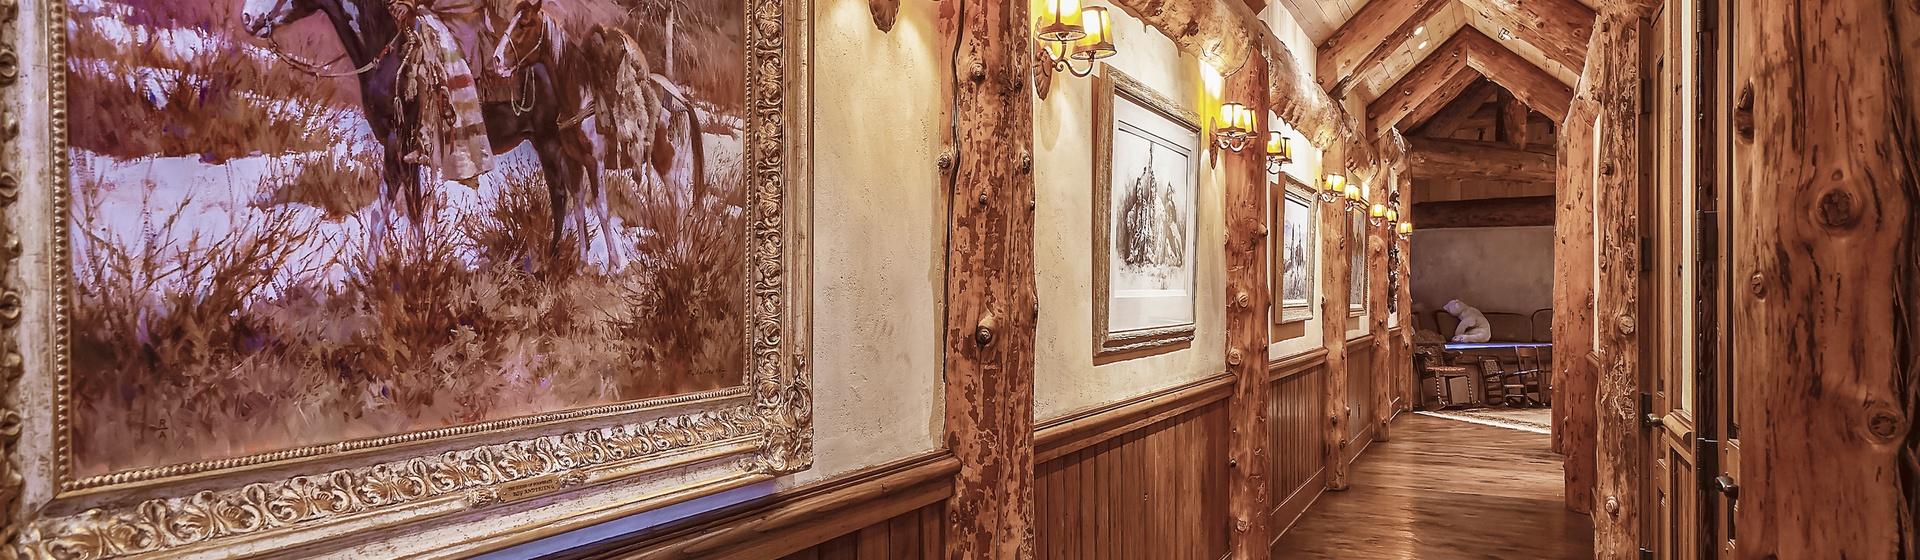 6.5-Telluride-Sleeping-Indian-Ranch-second-floor-hallway-art-walk-web.JPG